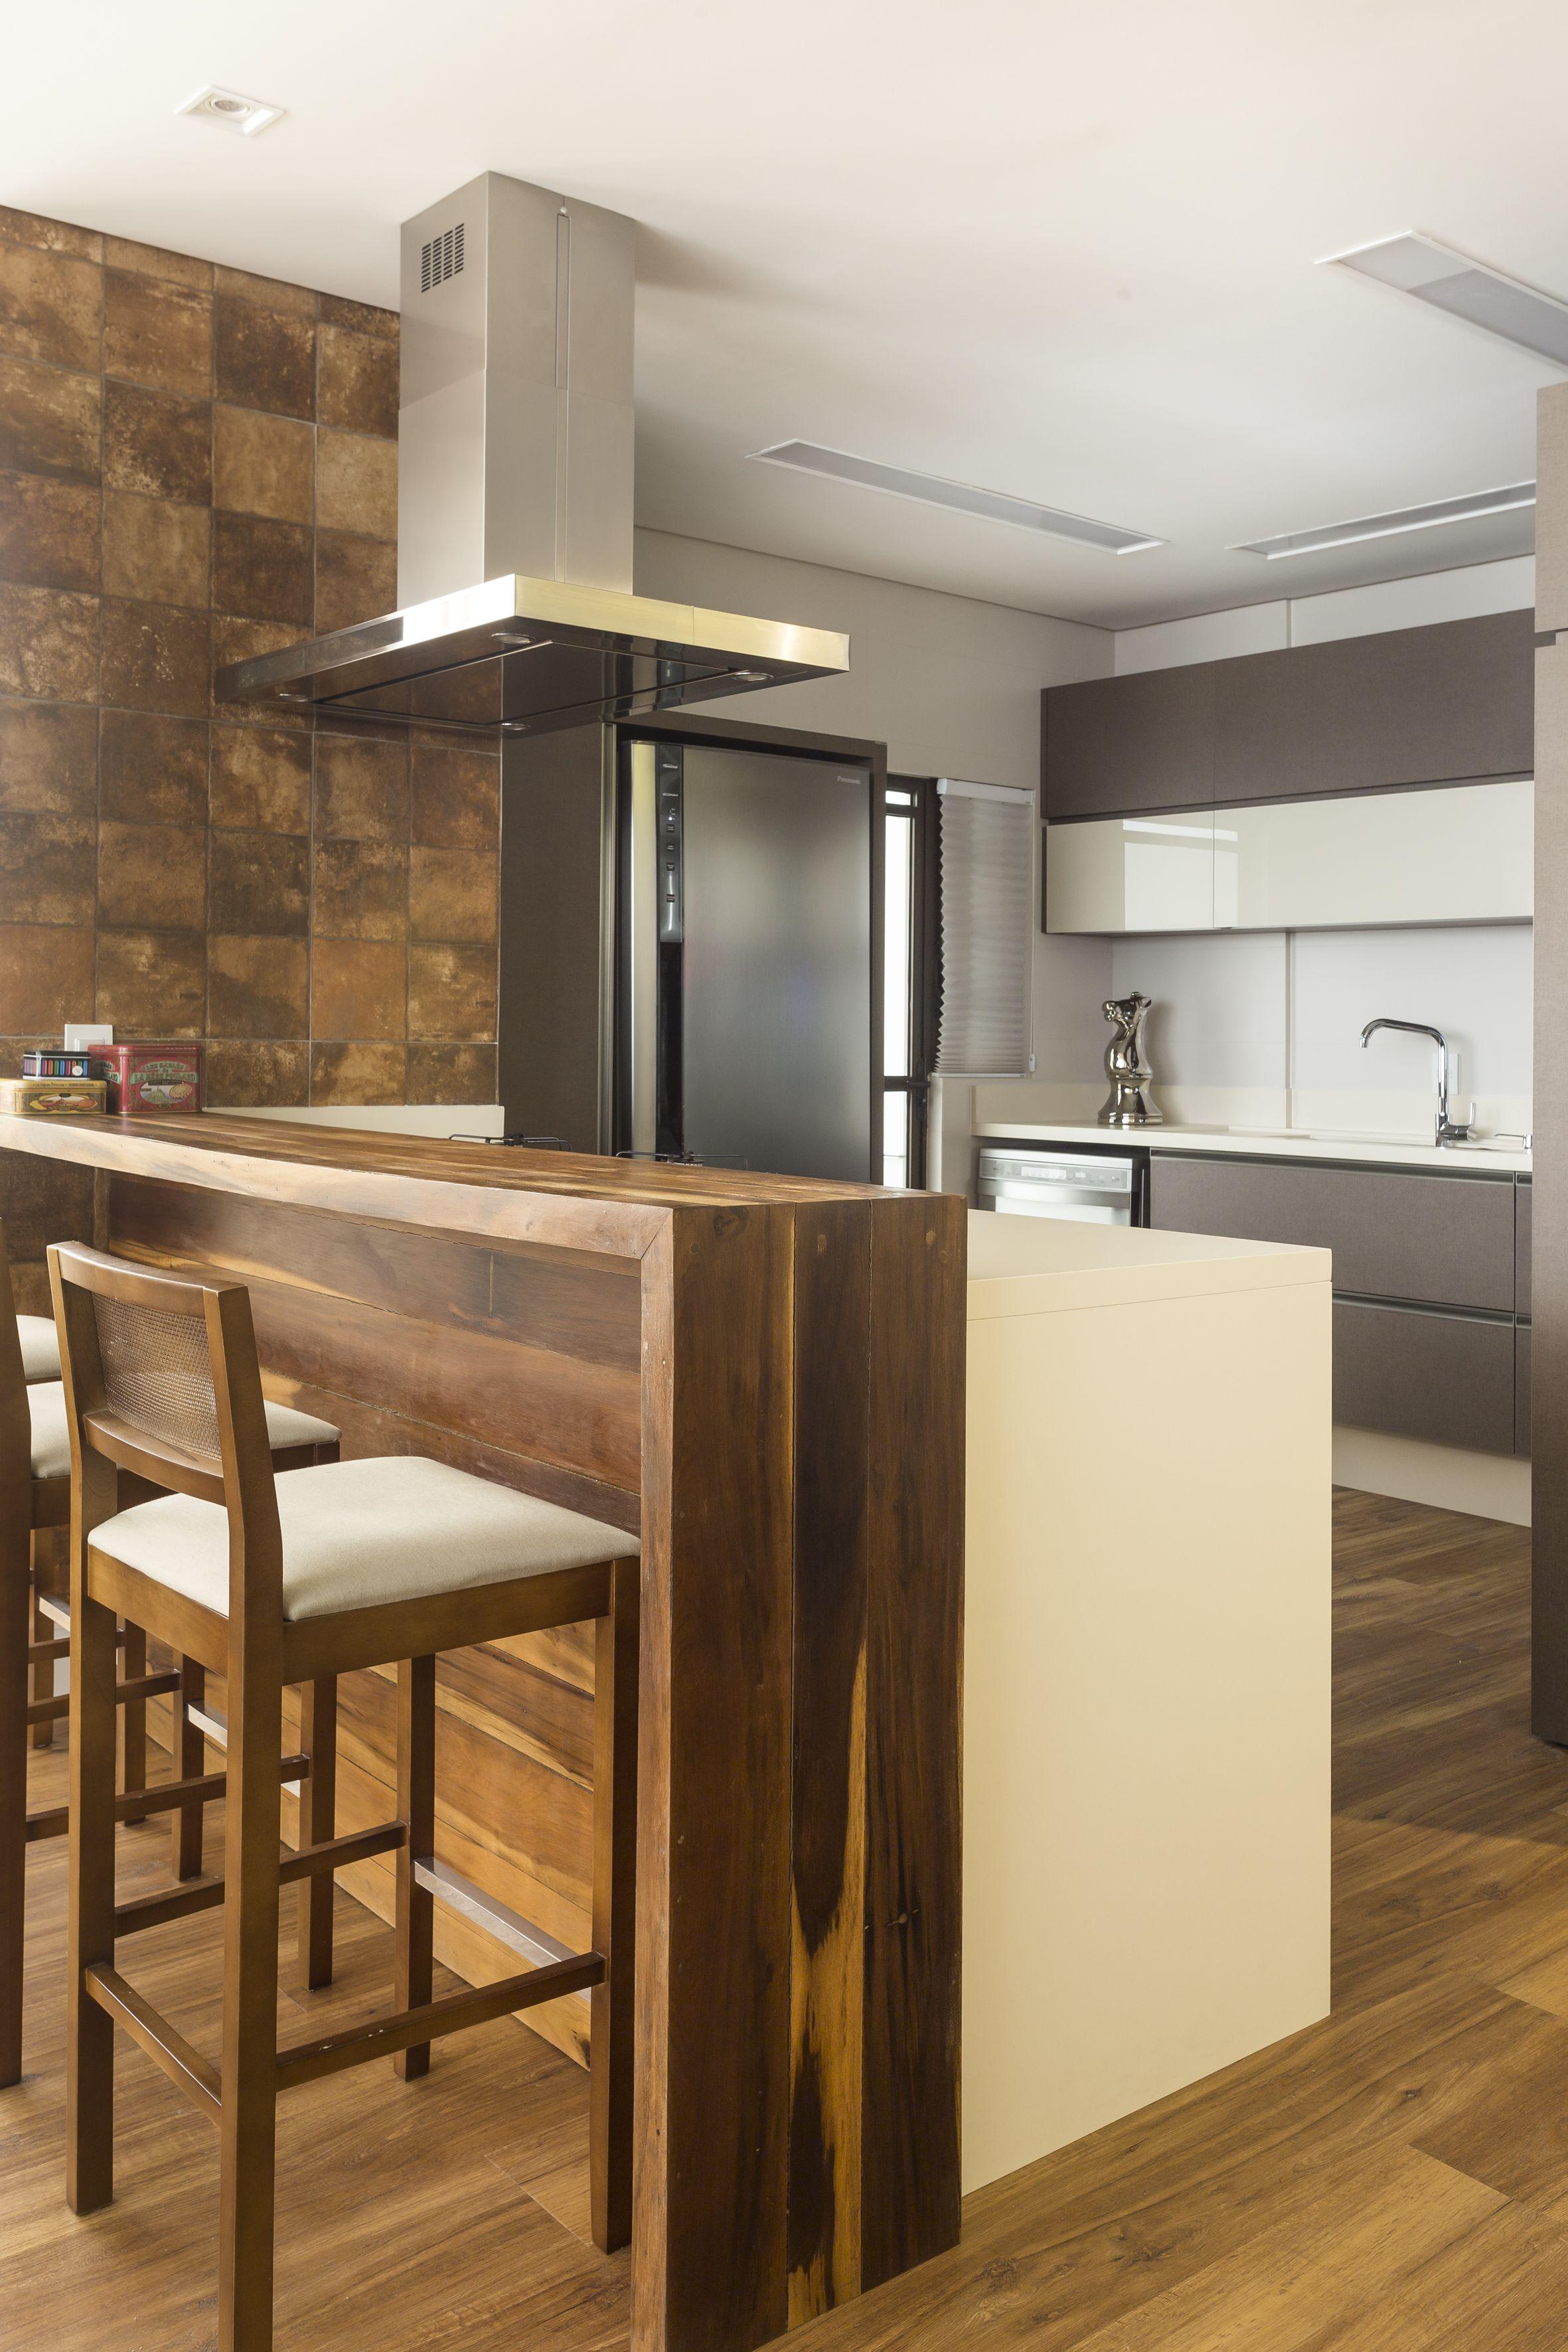 Barra de madera | COCINA - COMEDOR | Pinterest | Barras de madera ...